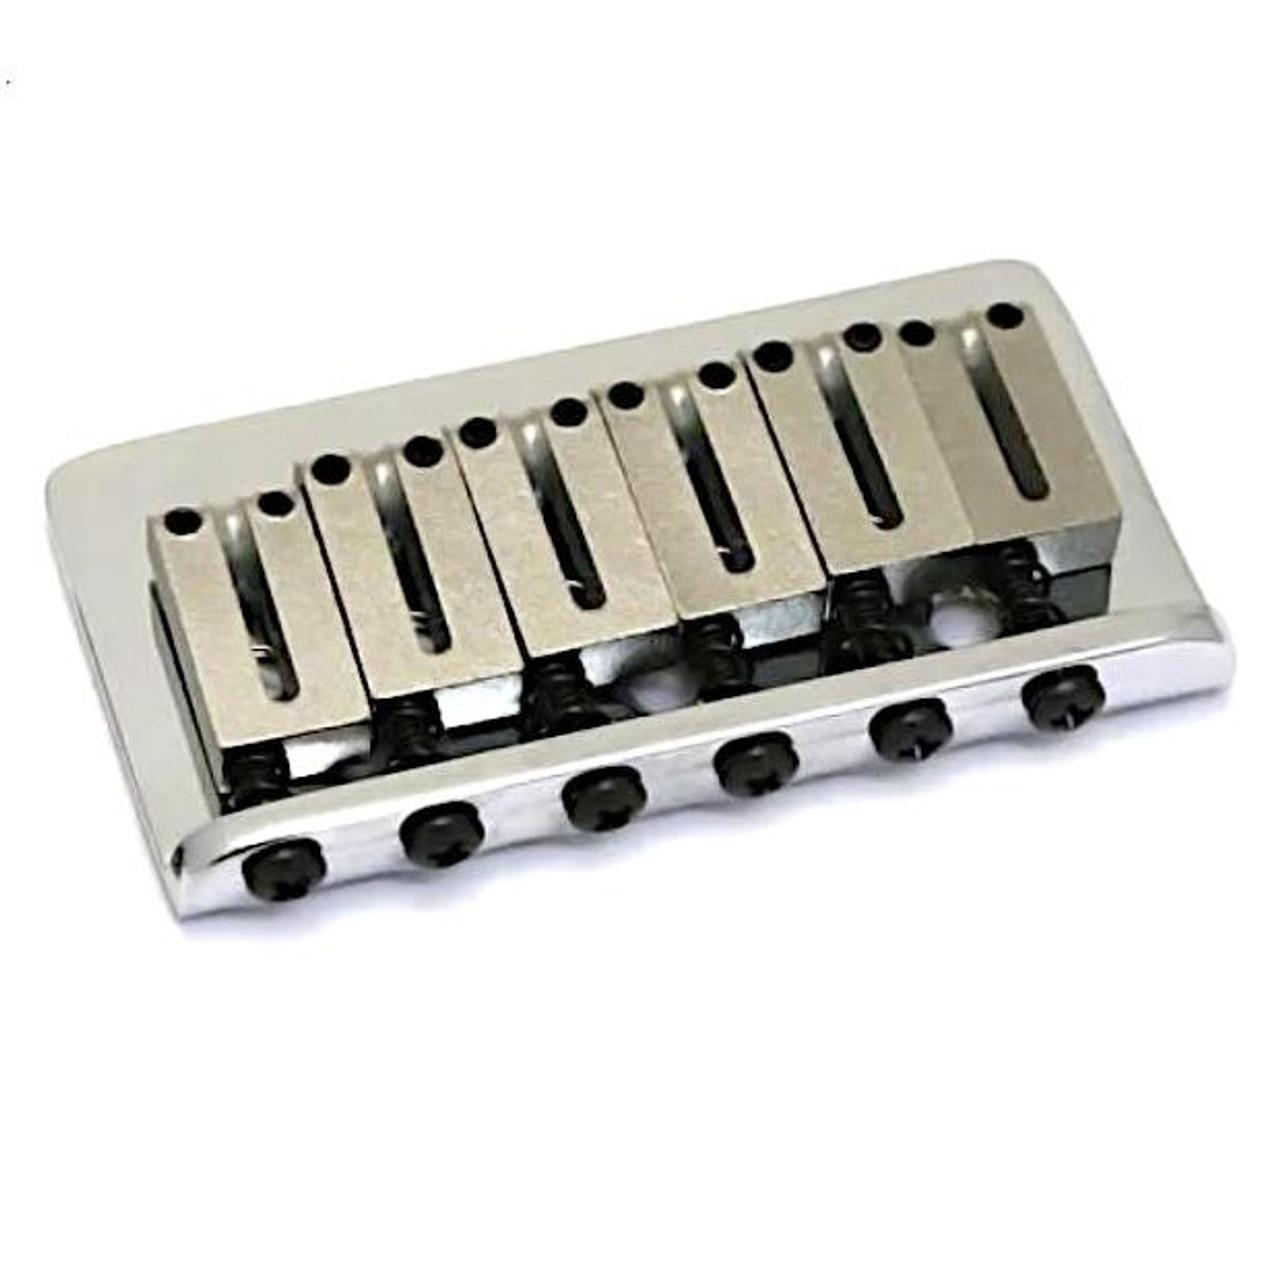 Fender American Standard Hardtail Strat Bridge-Chrome